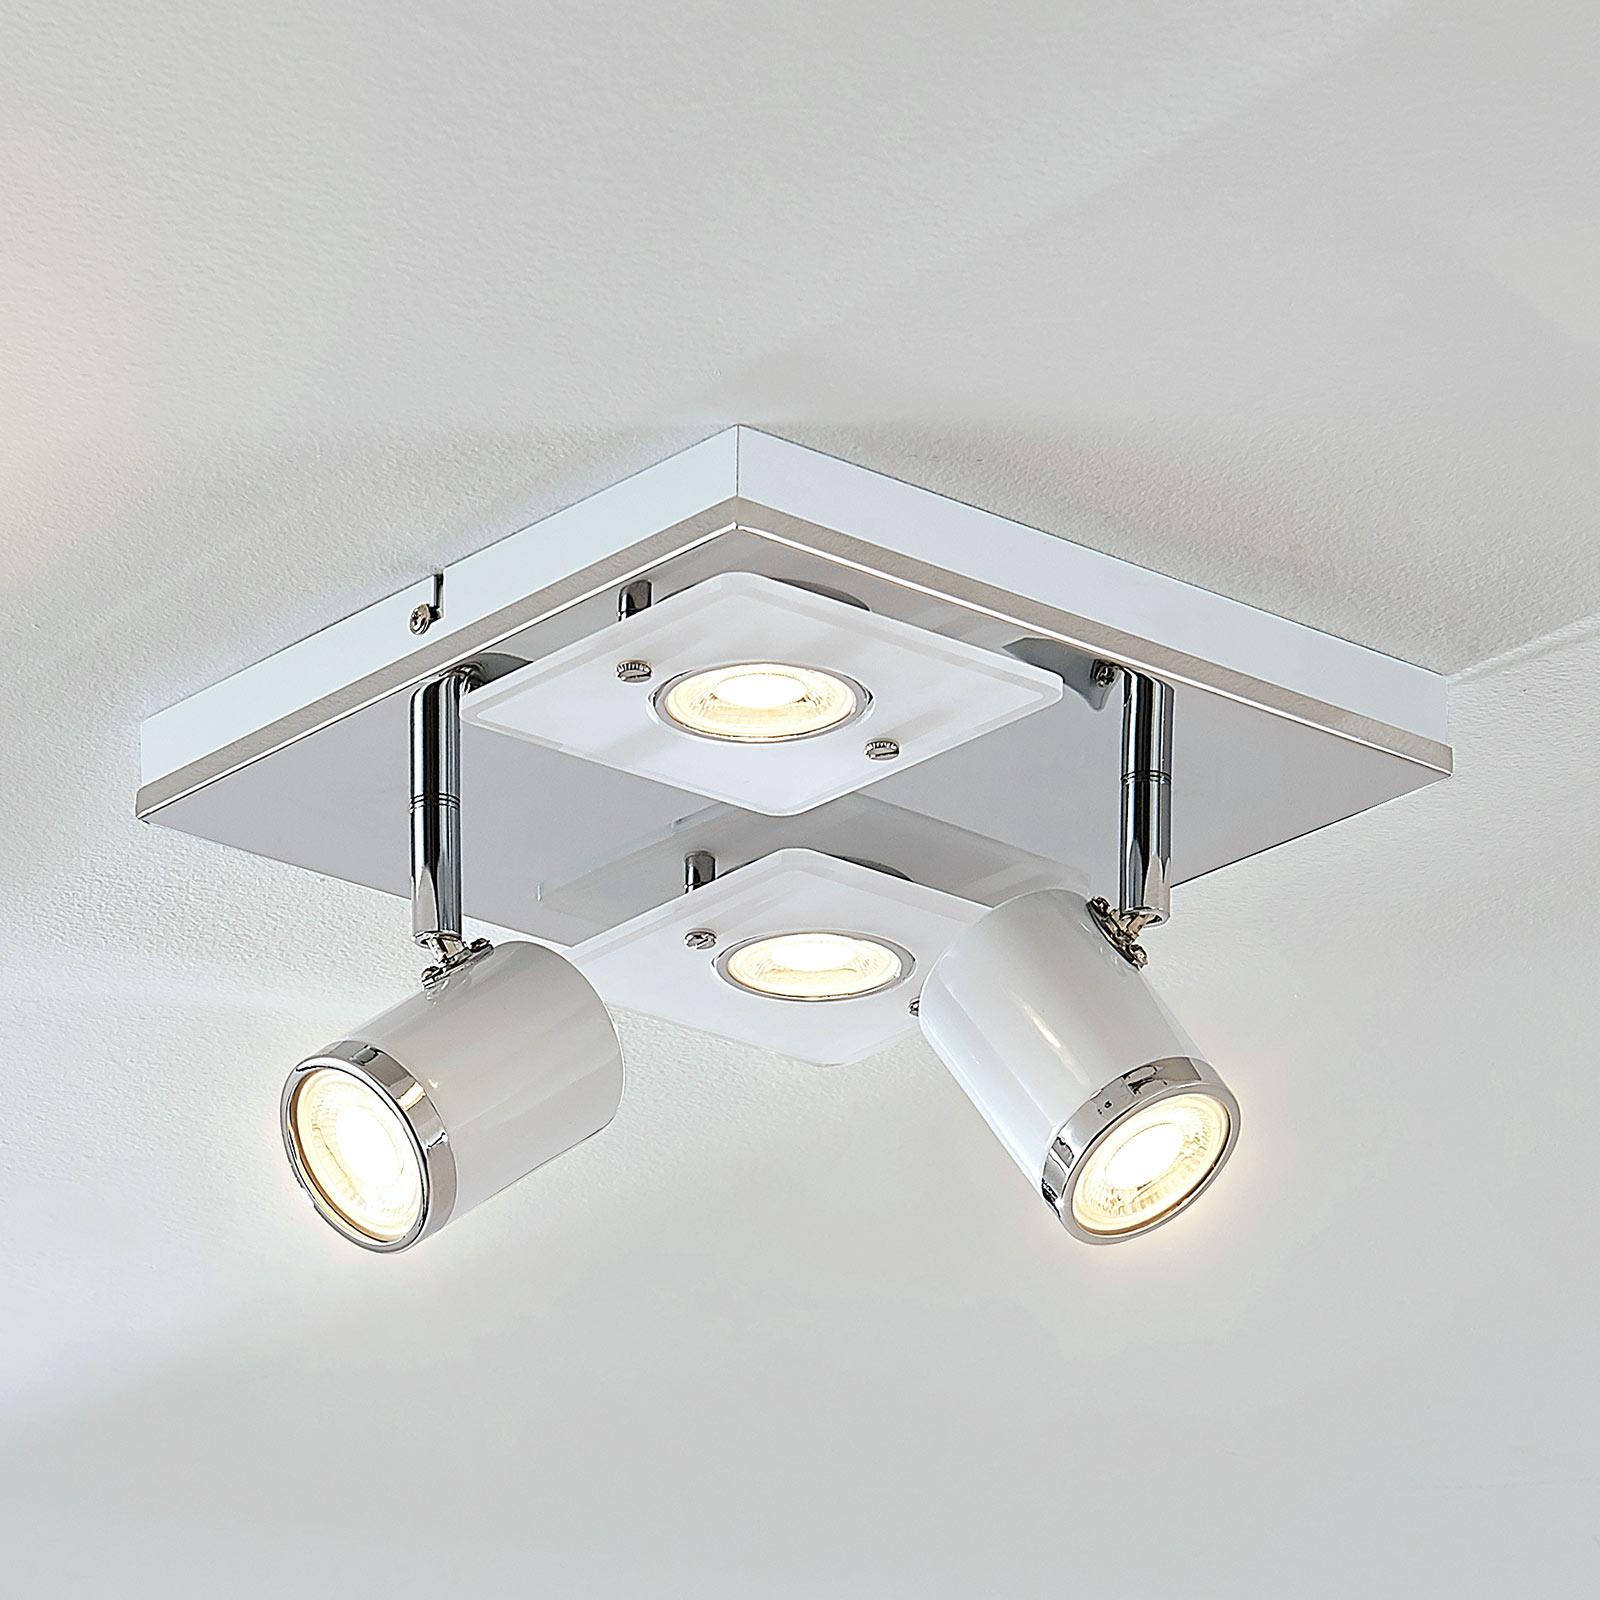 LED plafondlamp Alsuna, vier lampjes, 24x24 cm